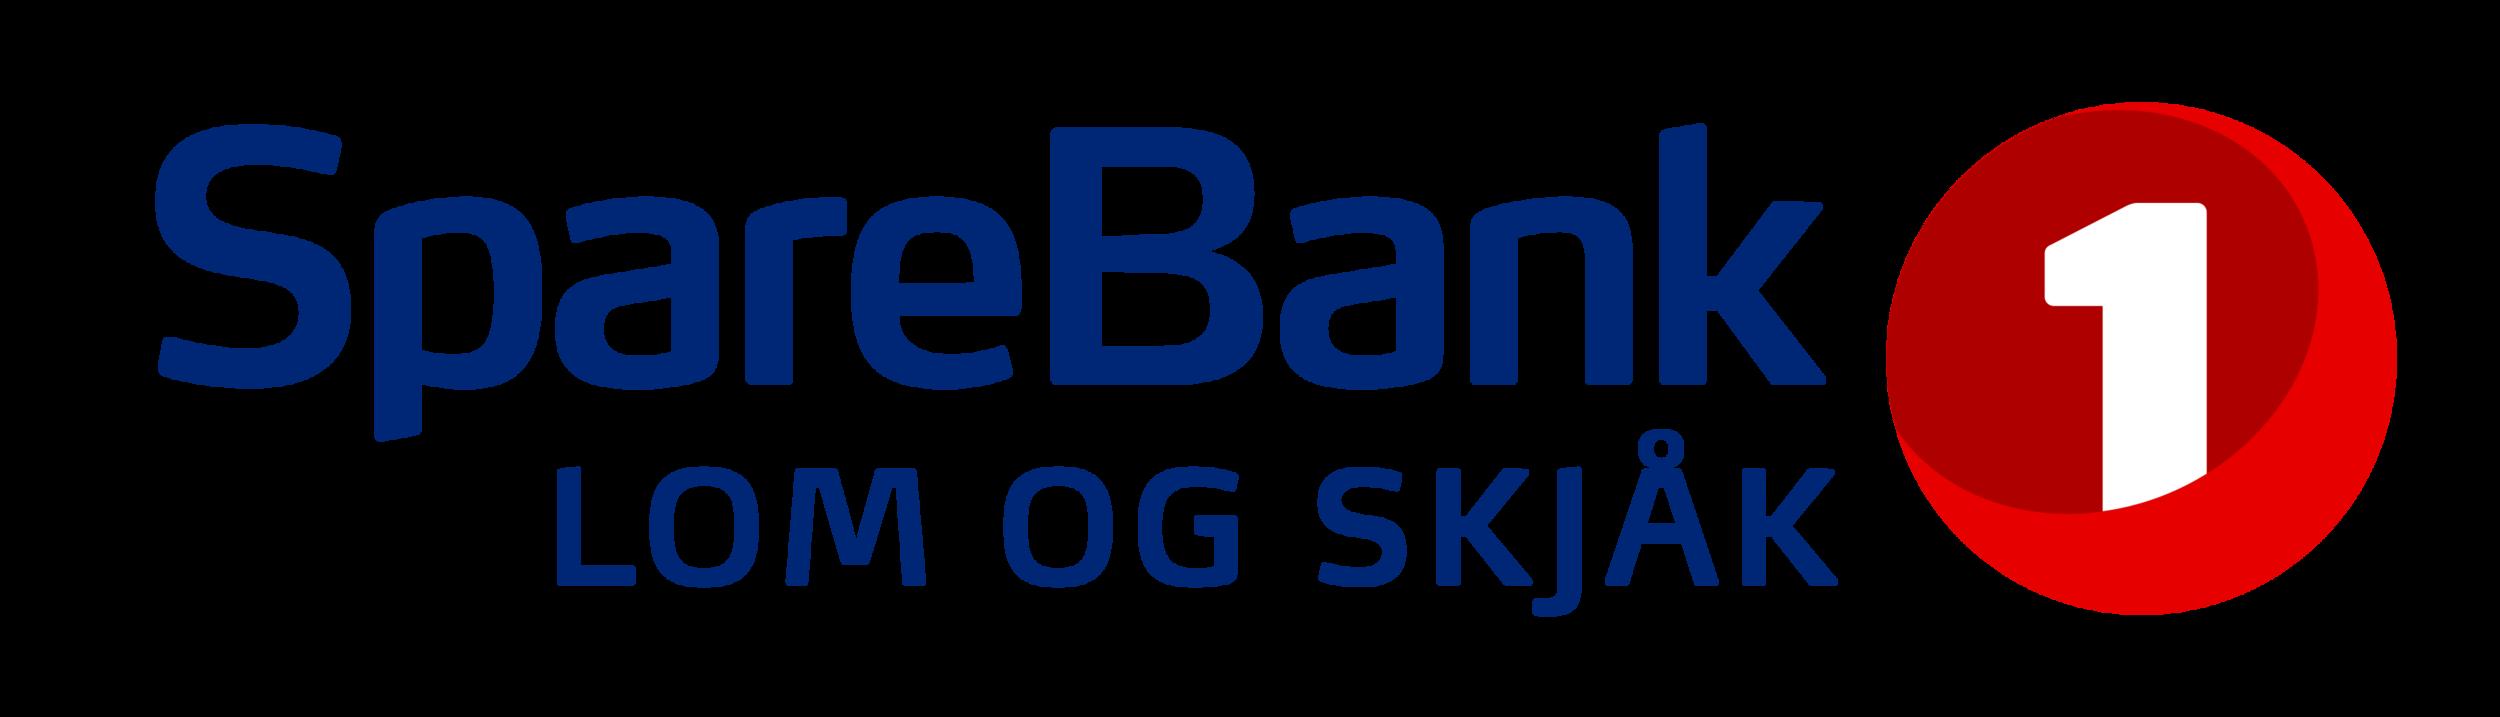 rgb_SB1_Lom_skjaak_verti_pos logo Spb1 Lom & Skjåk.png